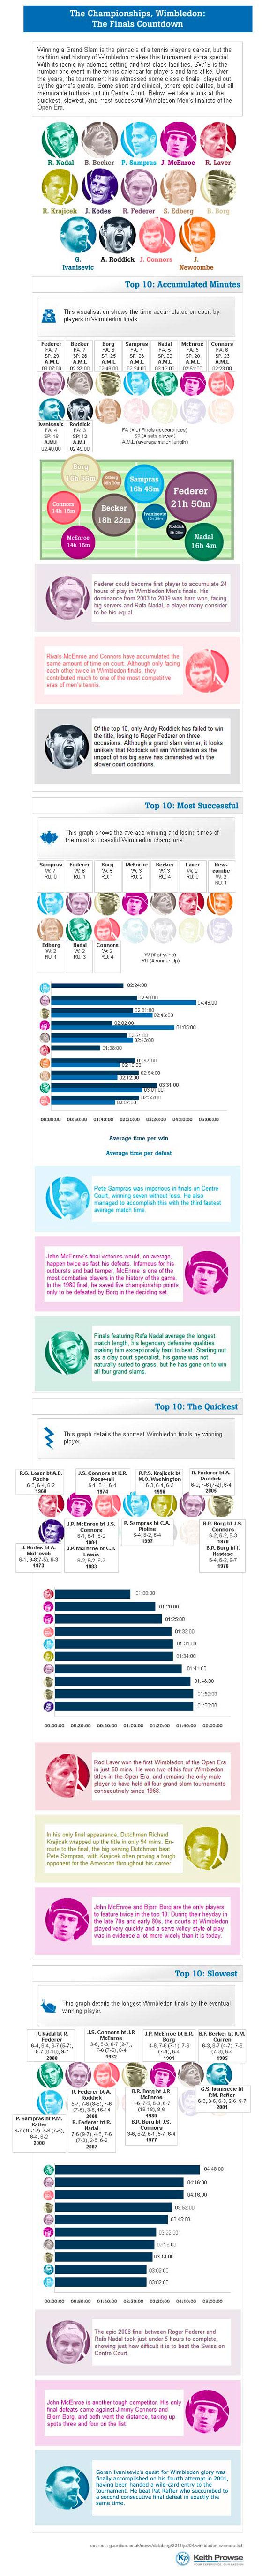 The Wimbledon Champions History-infographic